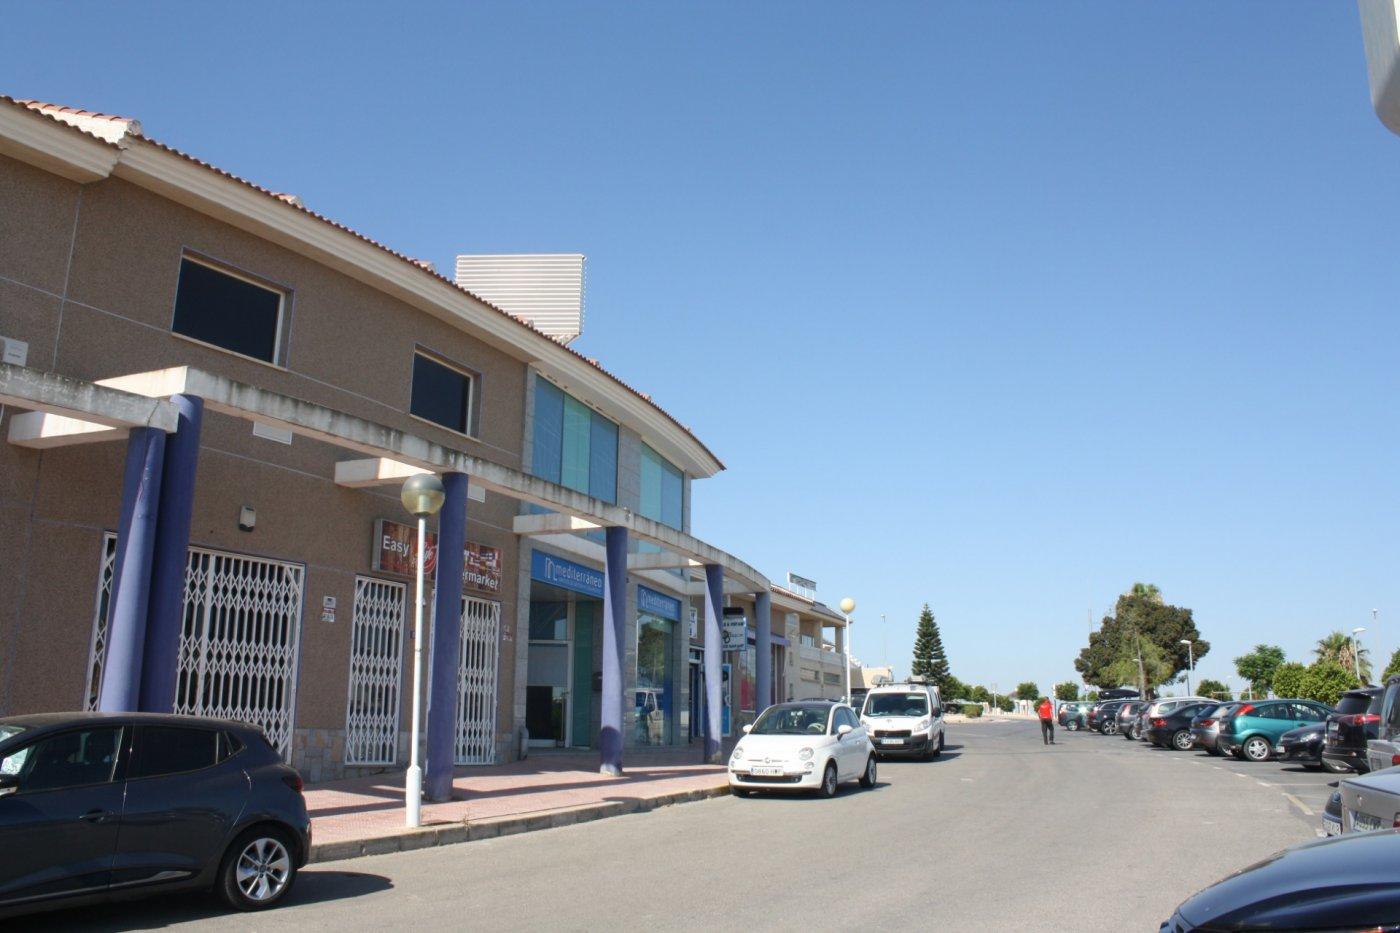 Geschäftsraum  Rojales ,doña pepa - ciudad quesada. Local comercial en esquina  en zona de expansión rodeado de come